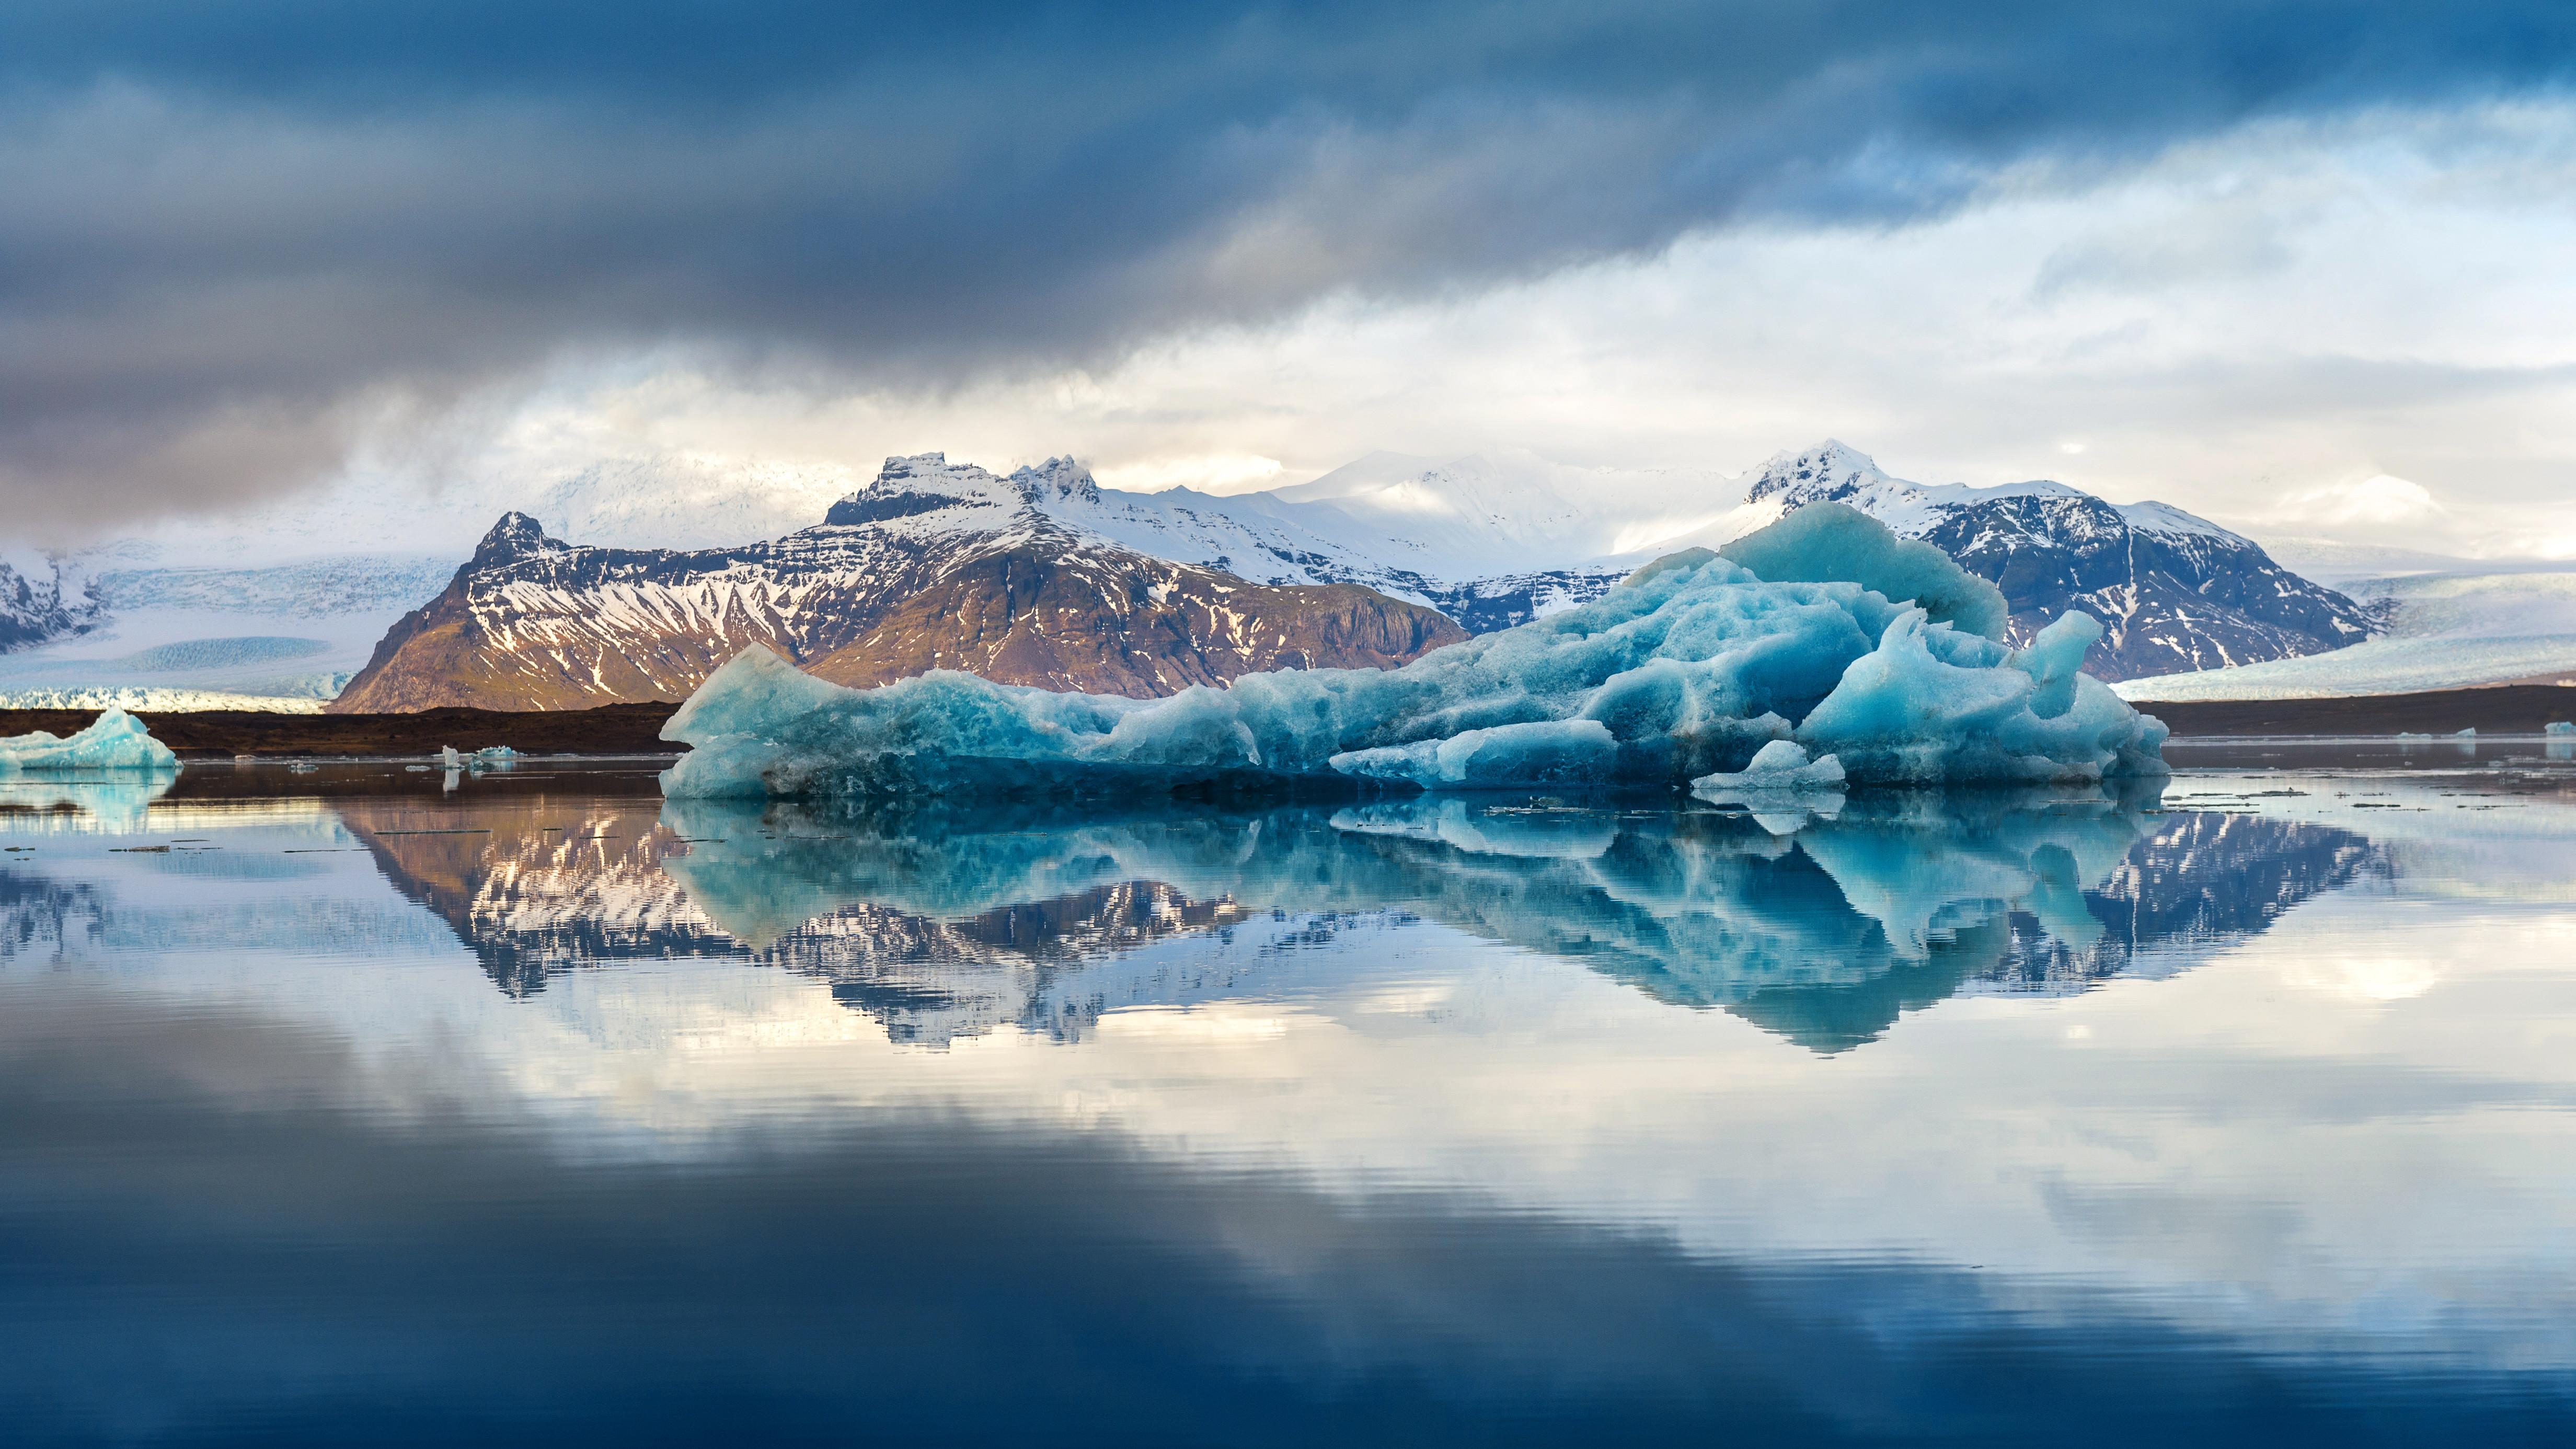 Icebergs in Jokulsarlon glacial lake, Iceland.